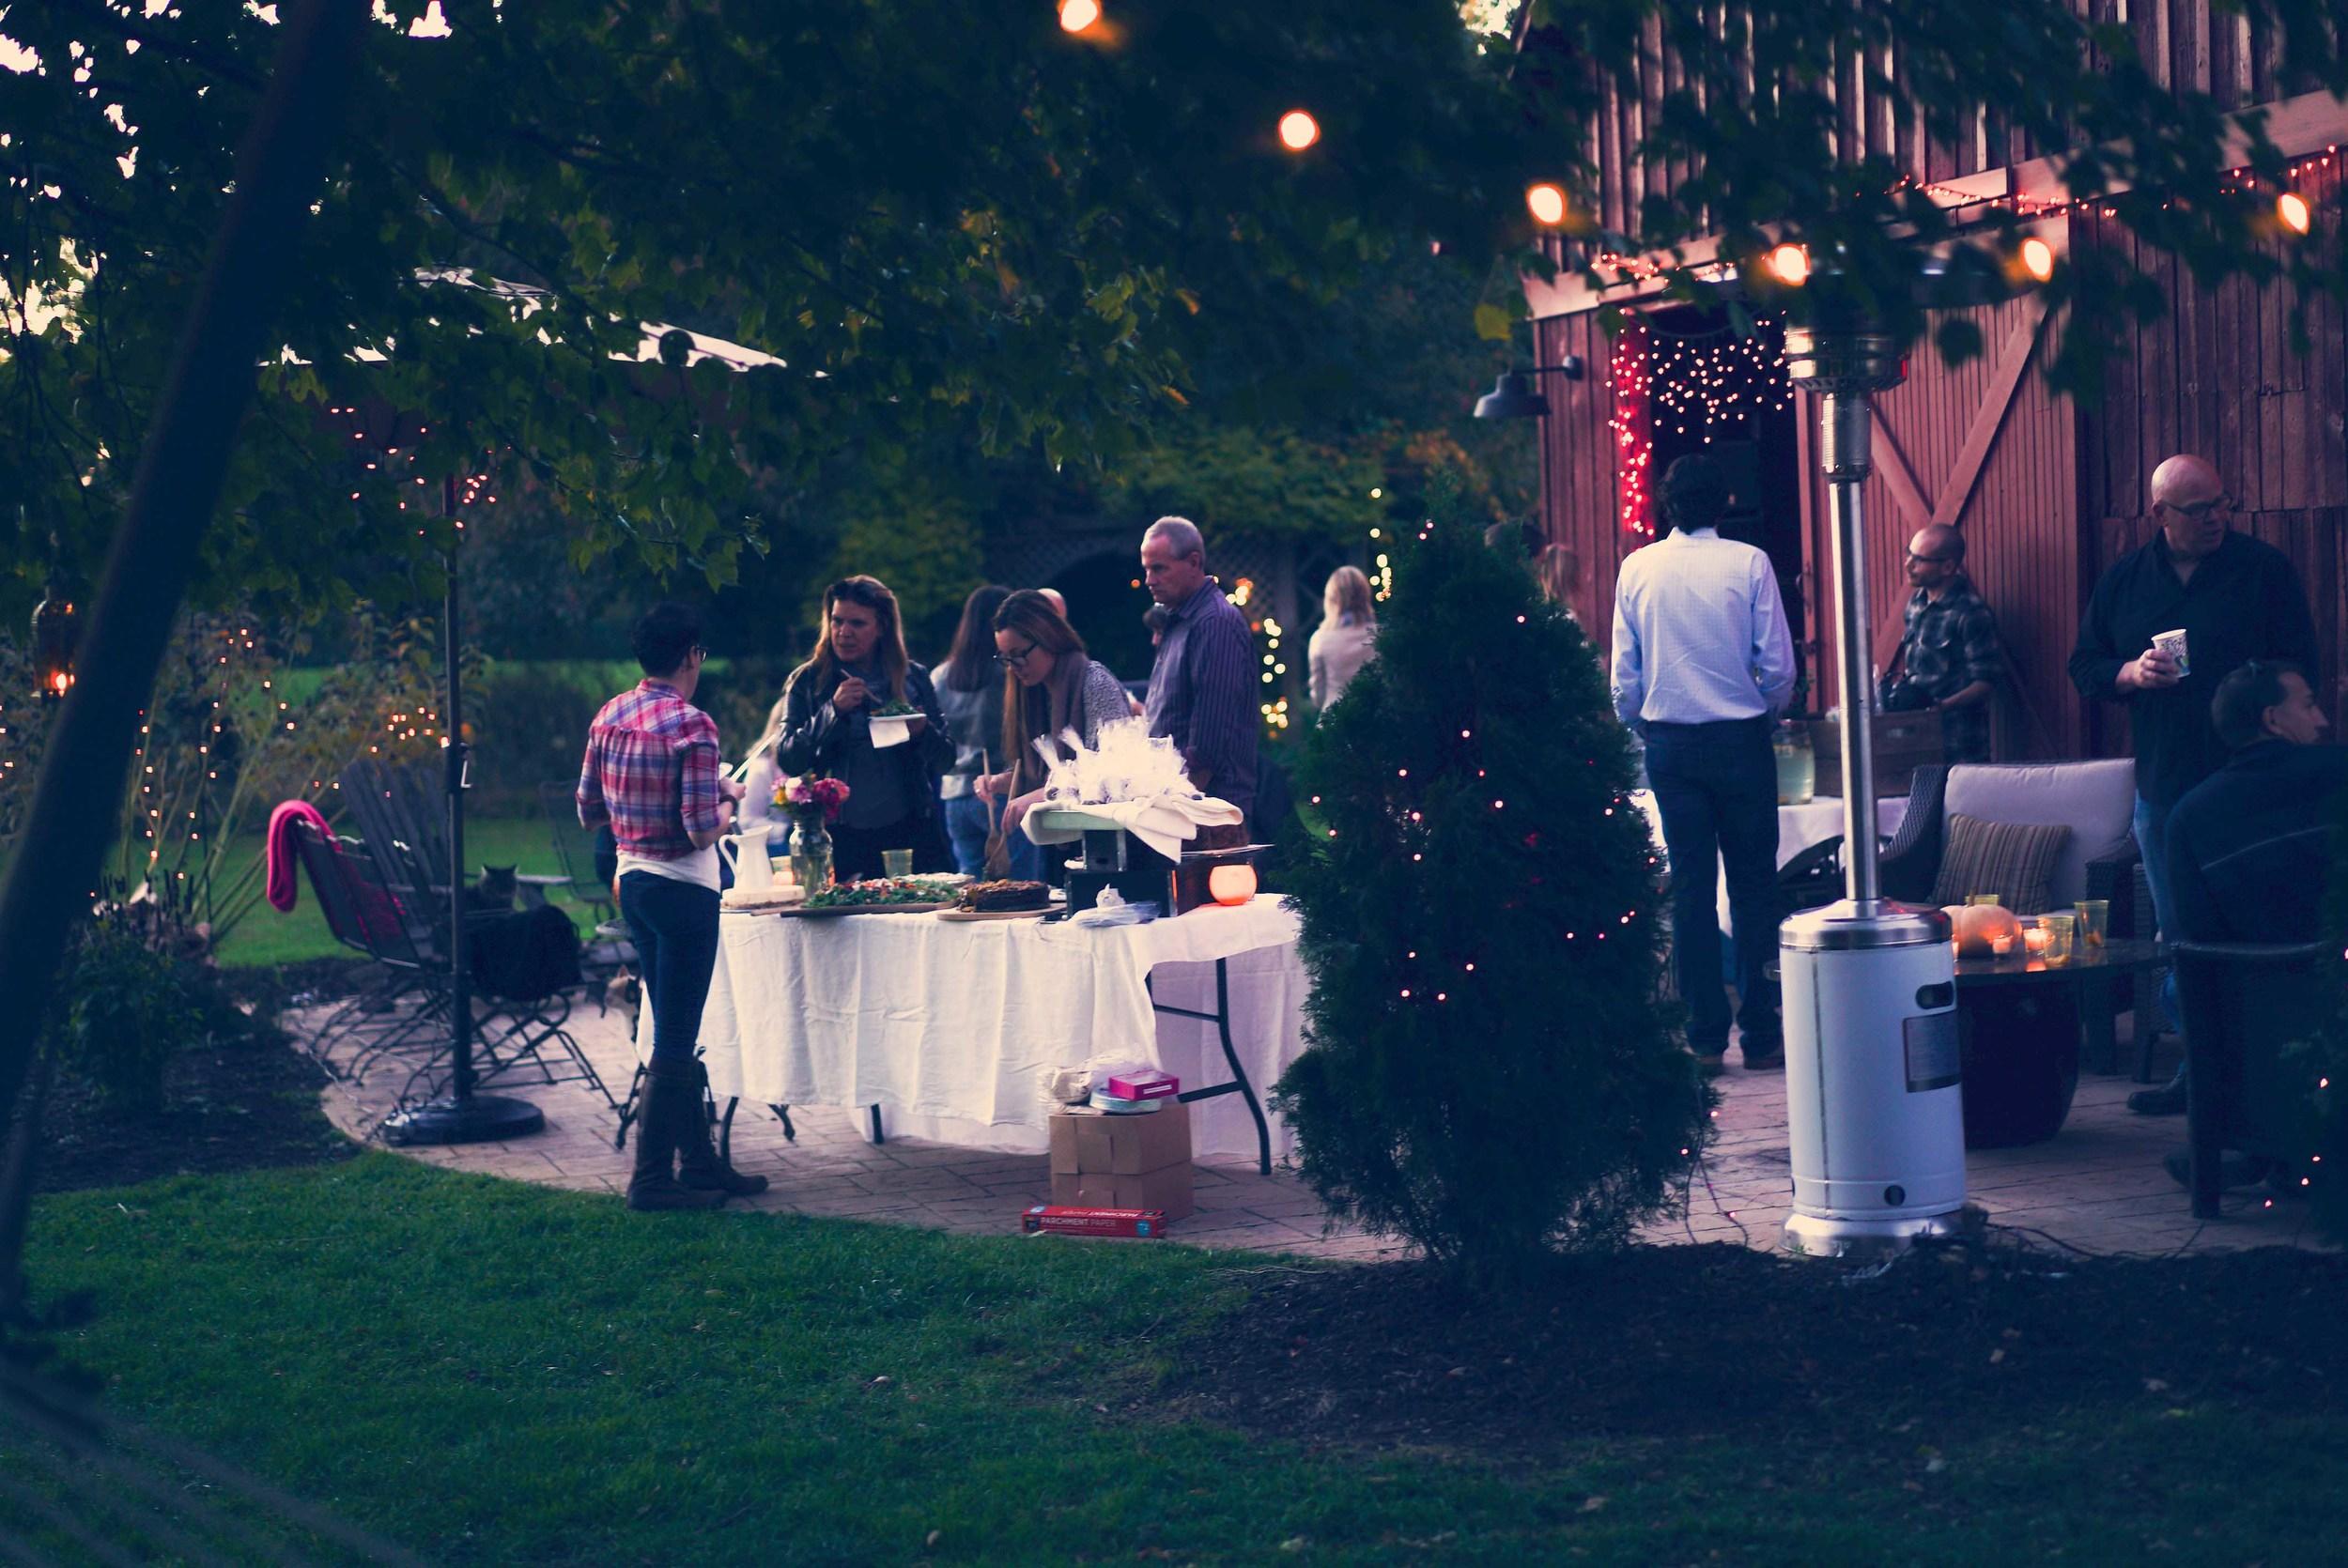 philadelphia_photographer_wedding_event7.jpg